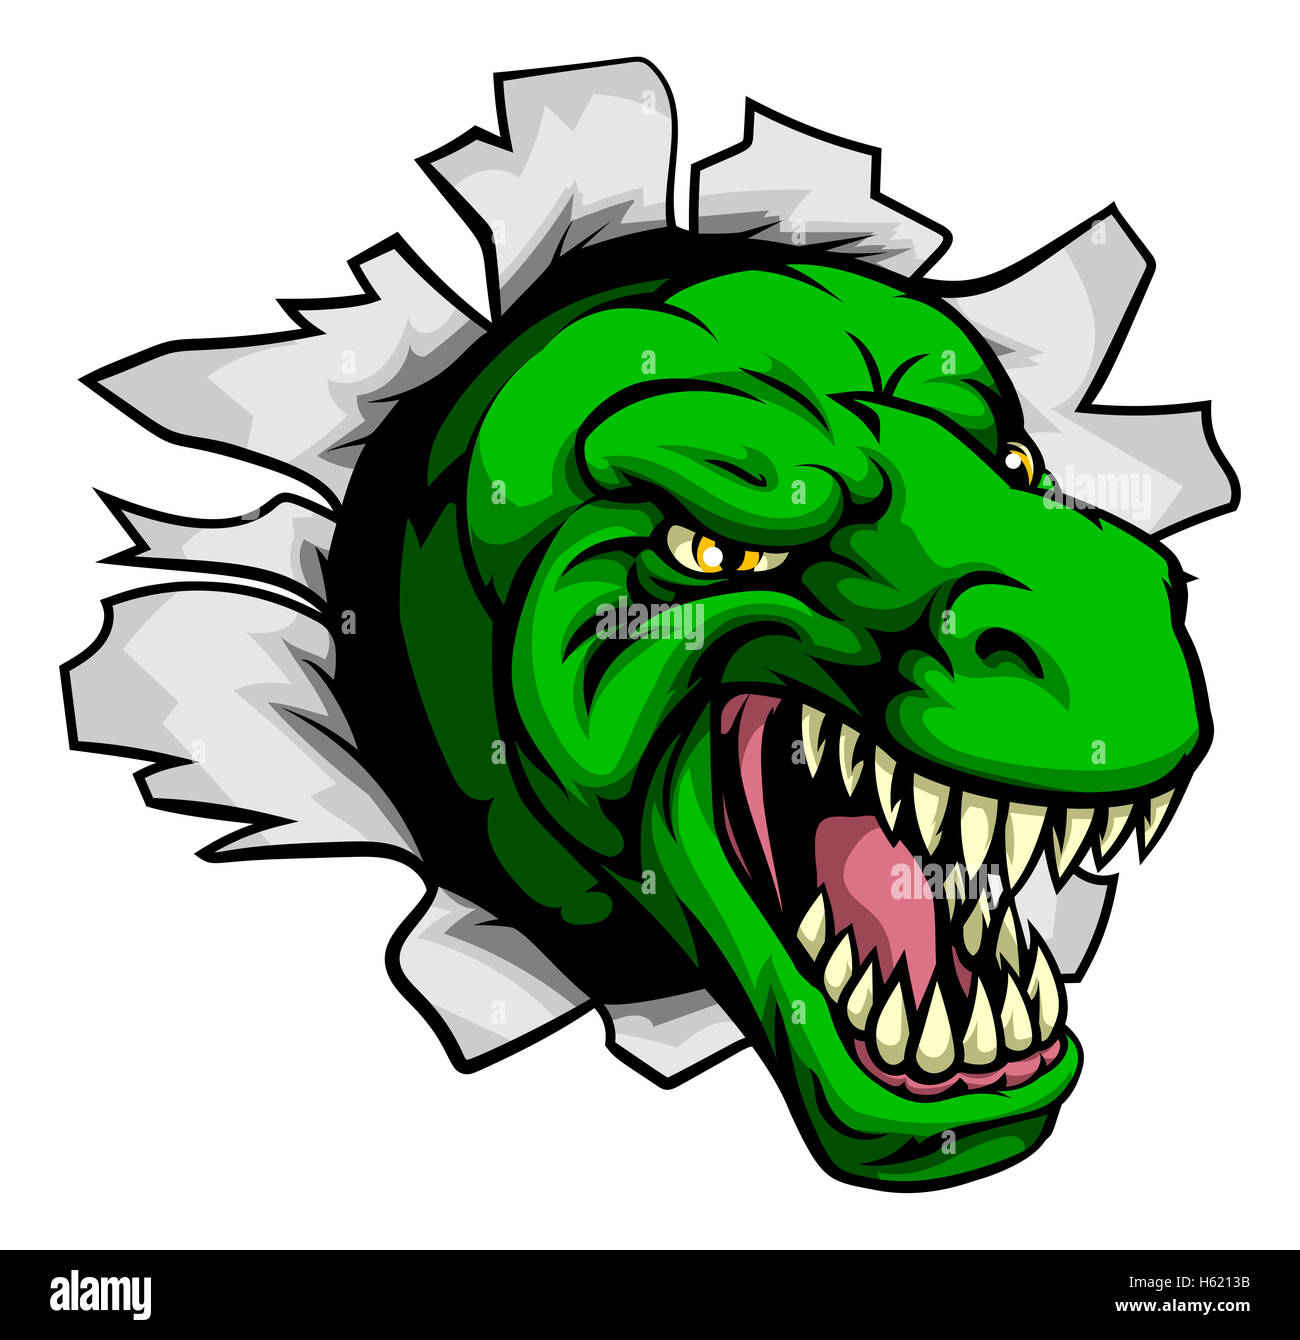 Dibujos Animados Dinosaurios Tyrannosaurus Rex T Rasga A Través Del